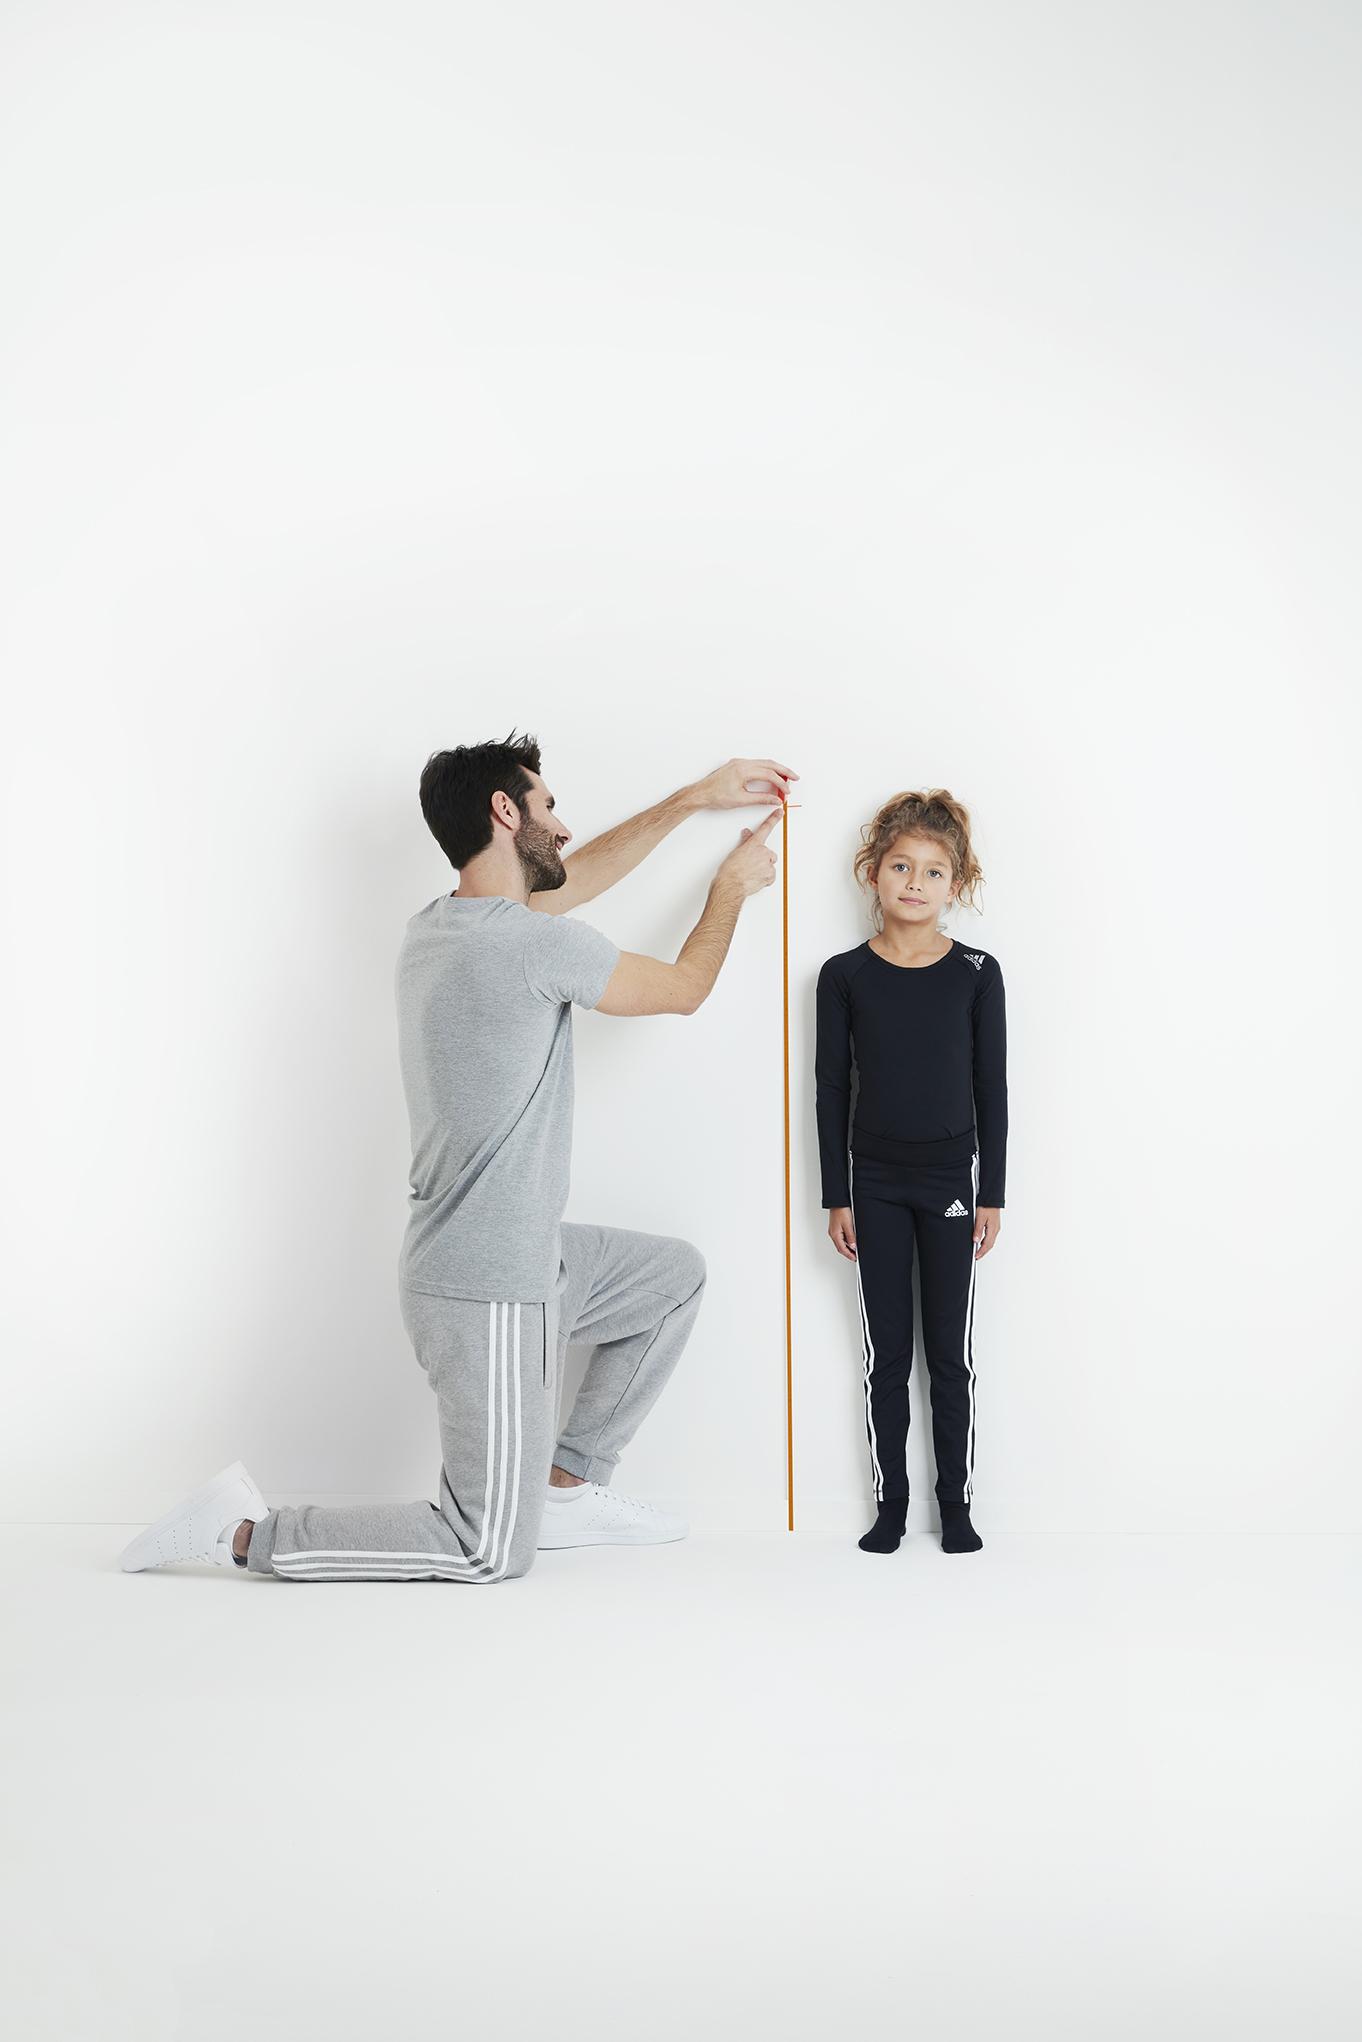 181128-WE-kids_04_Luna-Measurement_298